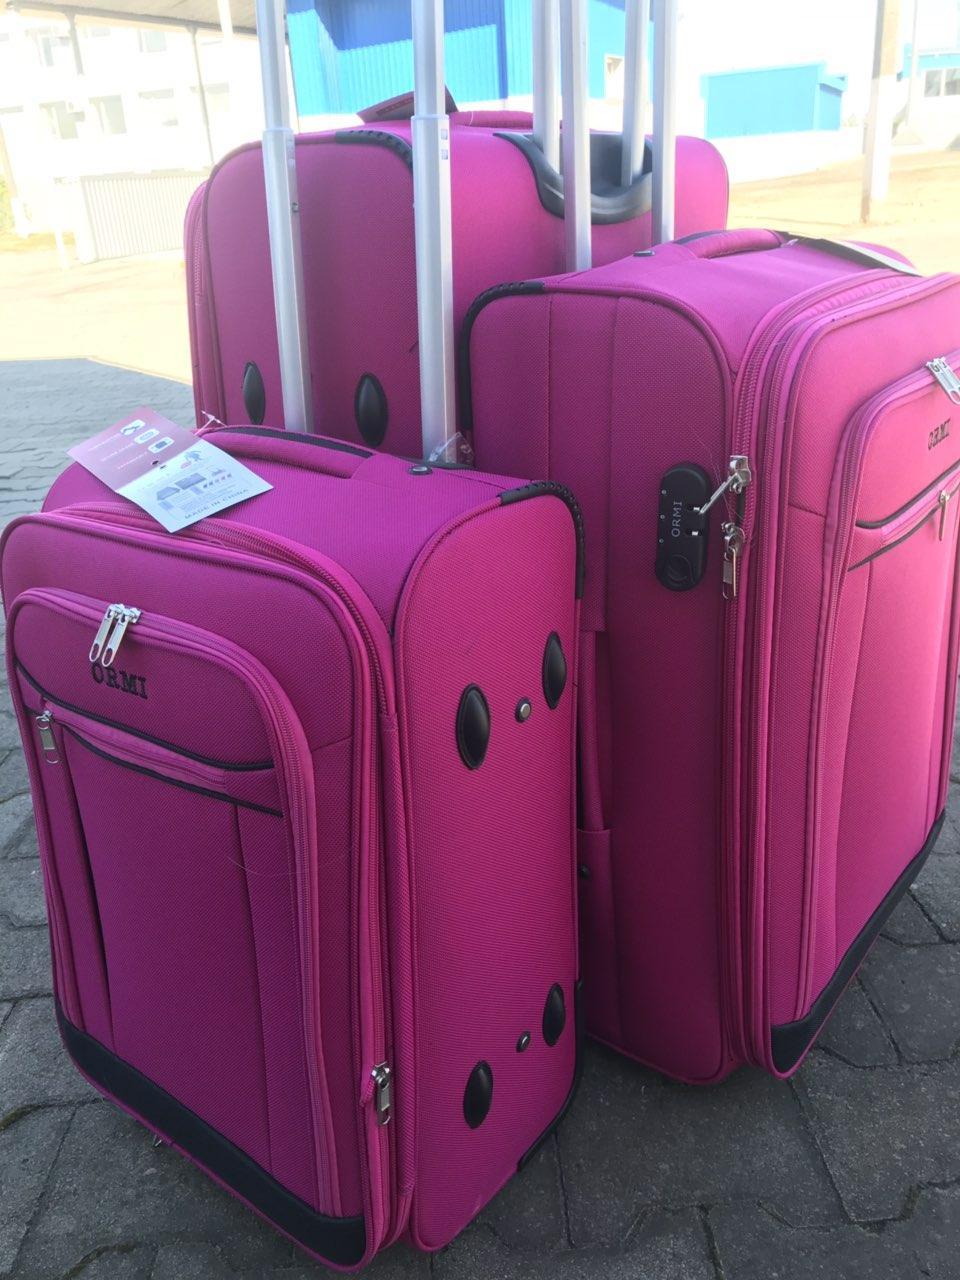 Средний тканевый чемодан Ormi 1318 на 2 колесах розовый, фото 1